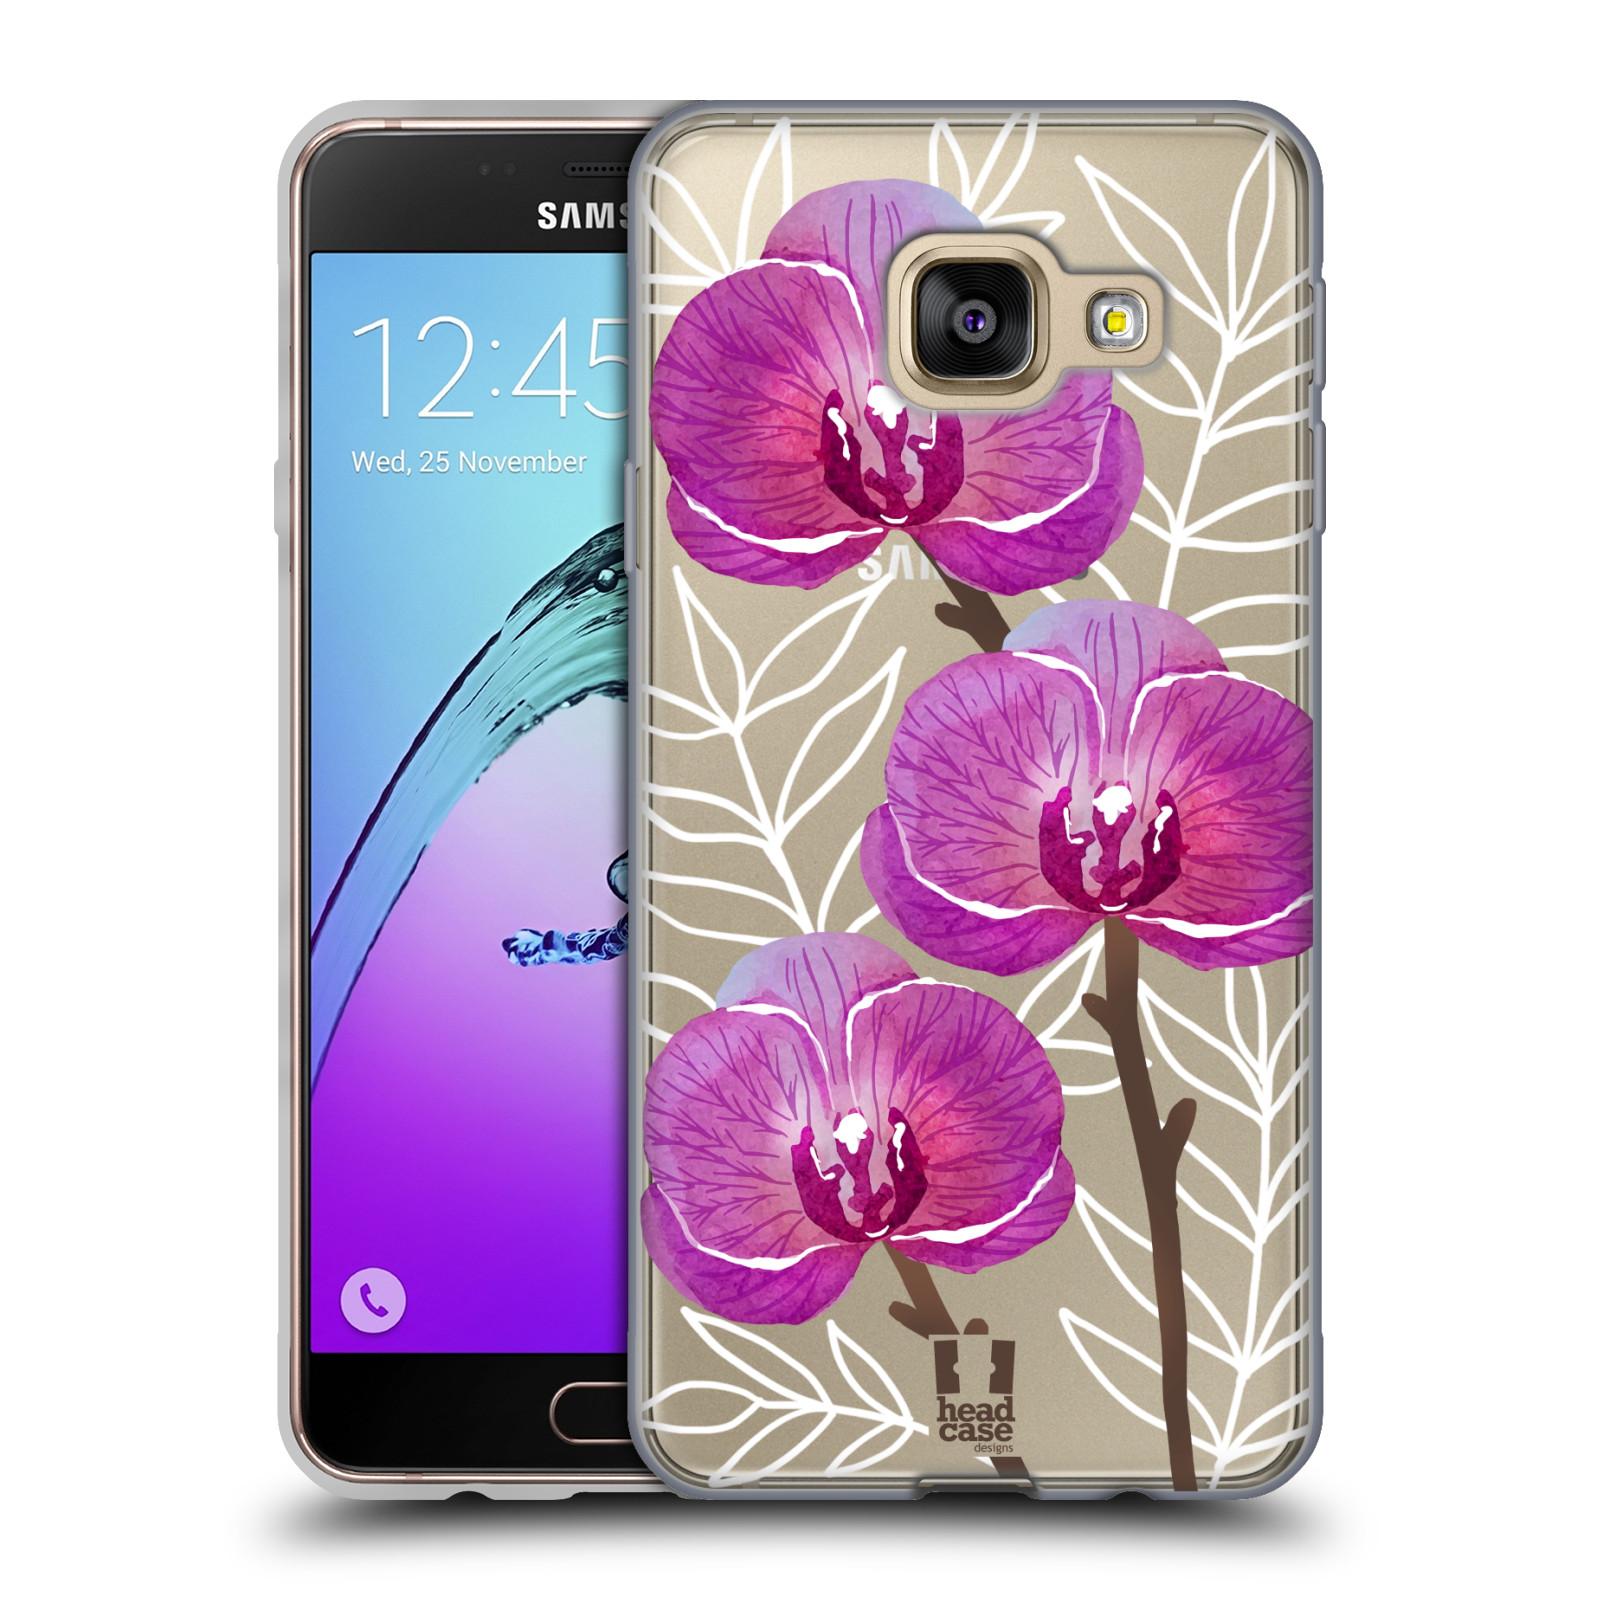 Silikonové pouzdro na mobil Samsung Galaxy A3 (2016) - Head Case - Hezoučké kvítky - průhledné